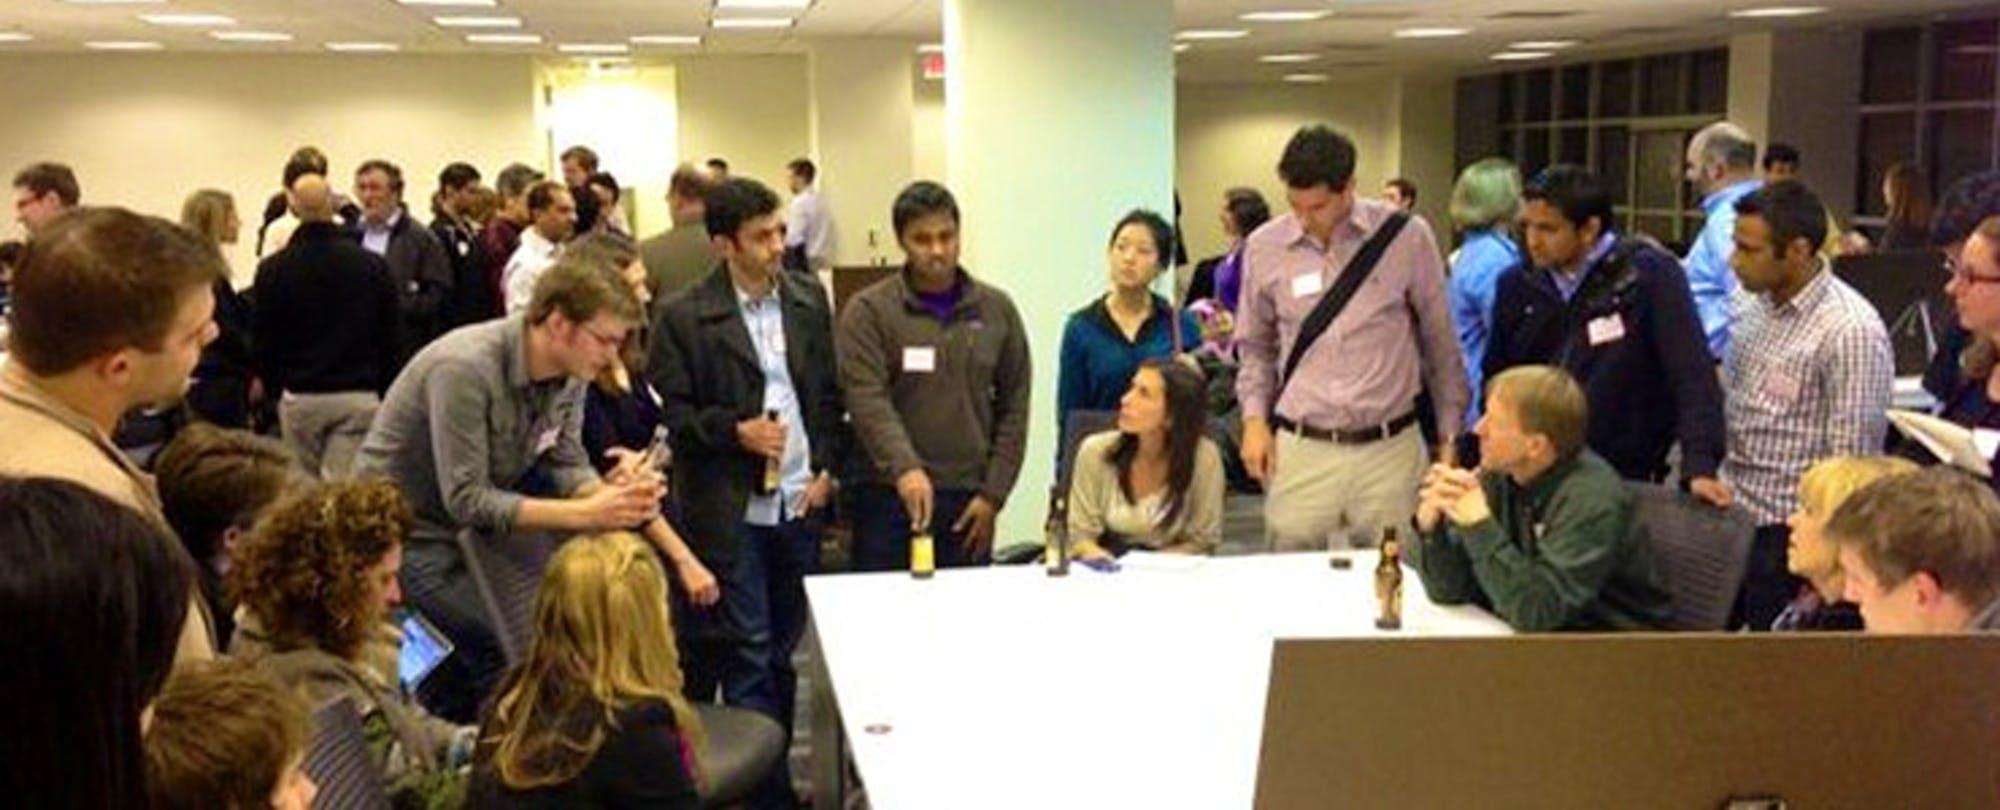 Meetup: Teacher Town Hall Draws A Crowd